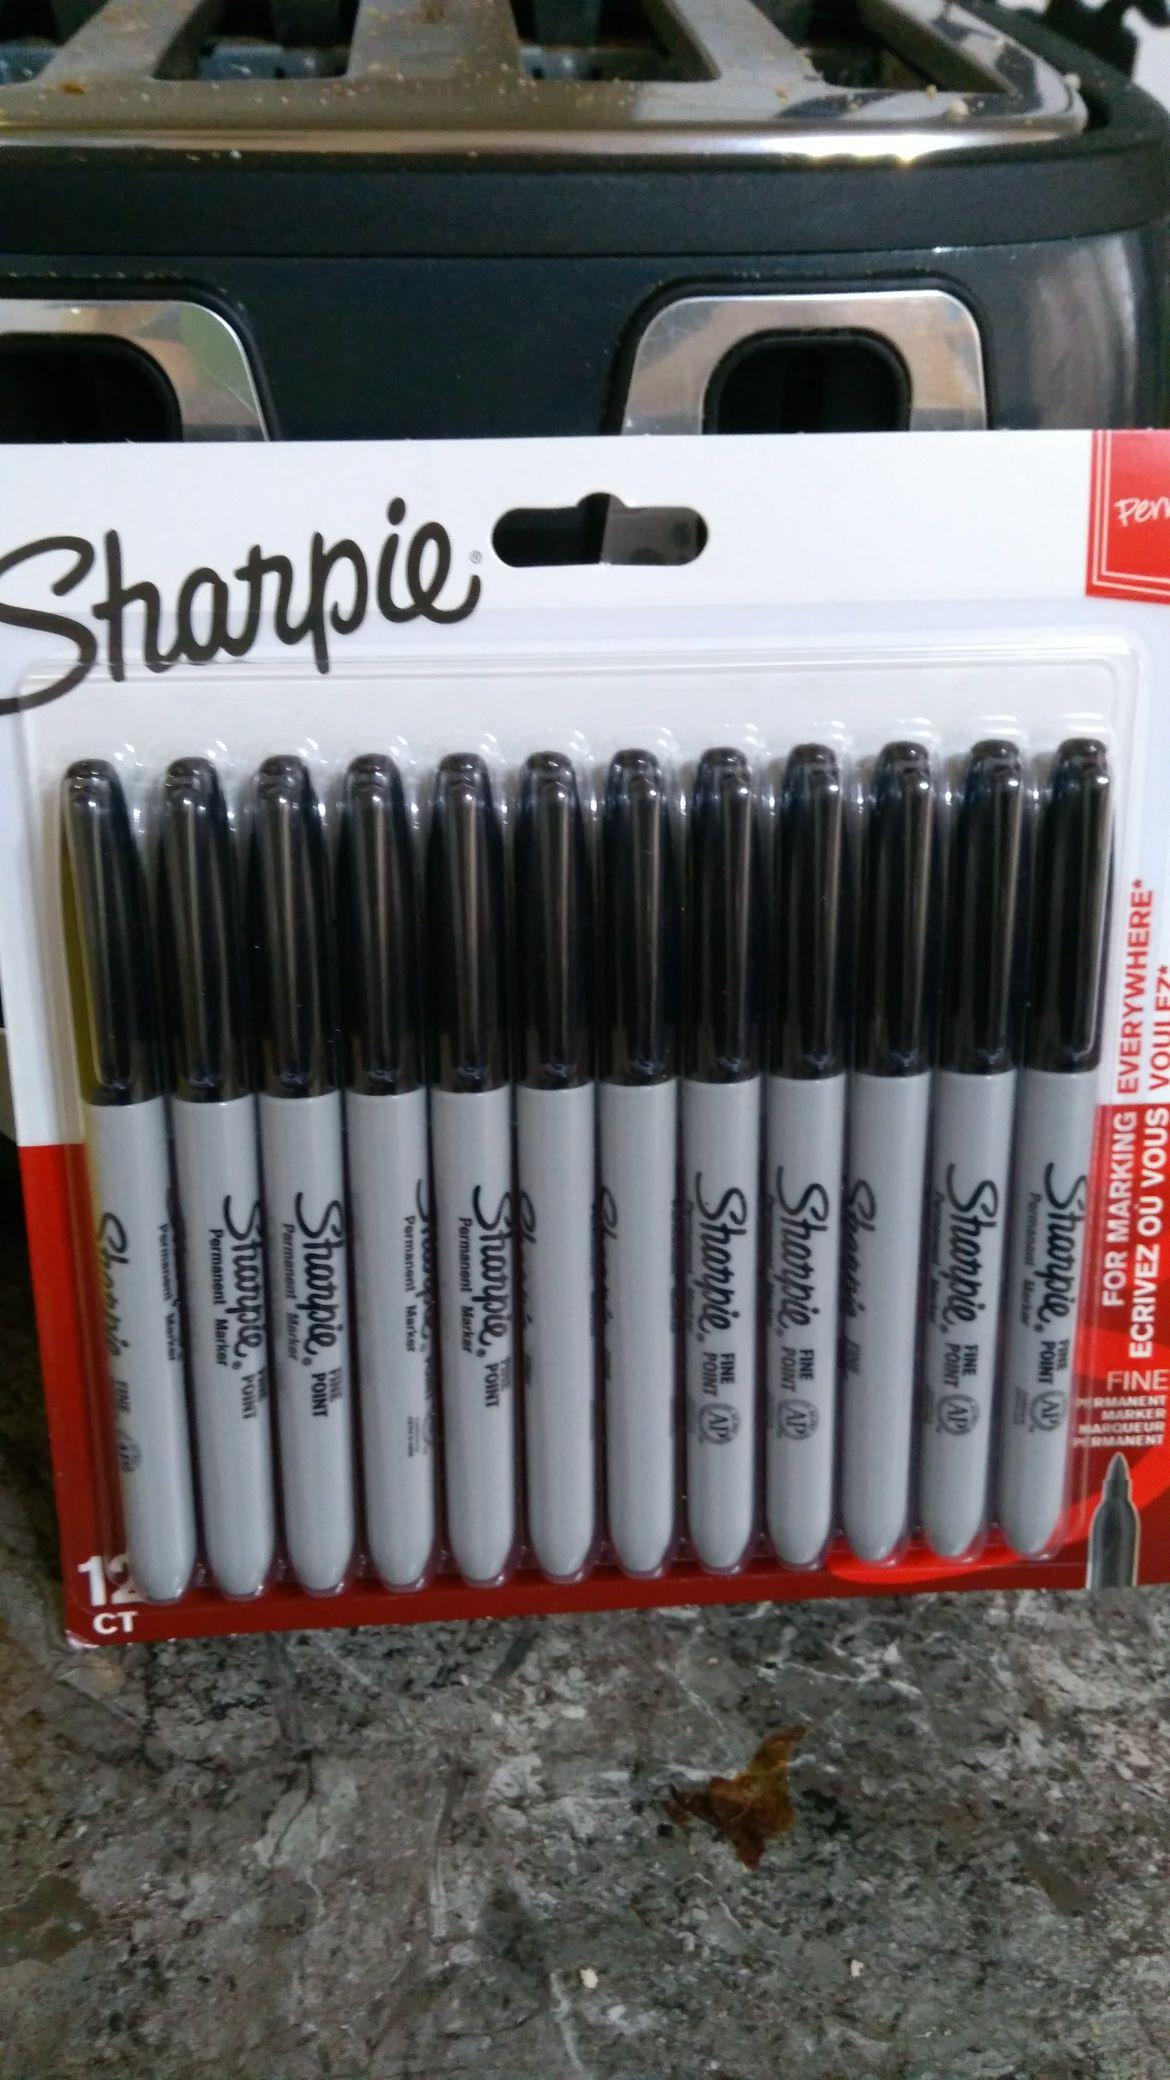 Asda 12 black Sharpies £5 instore (East London)